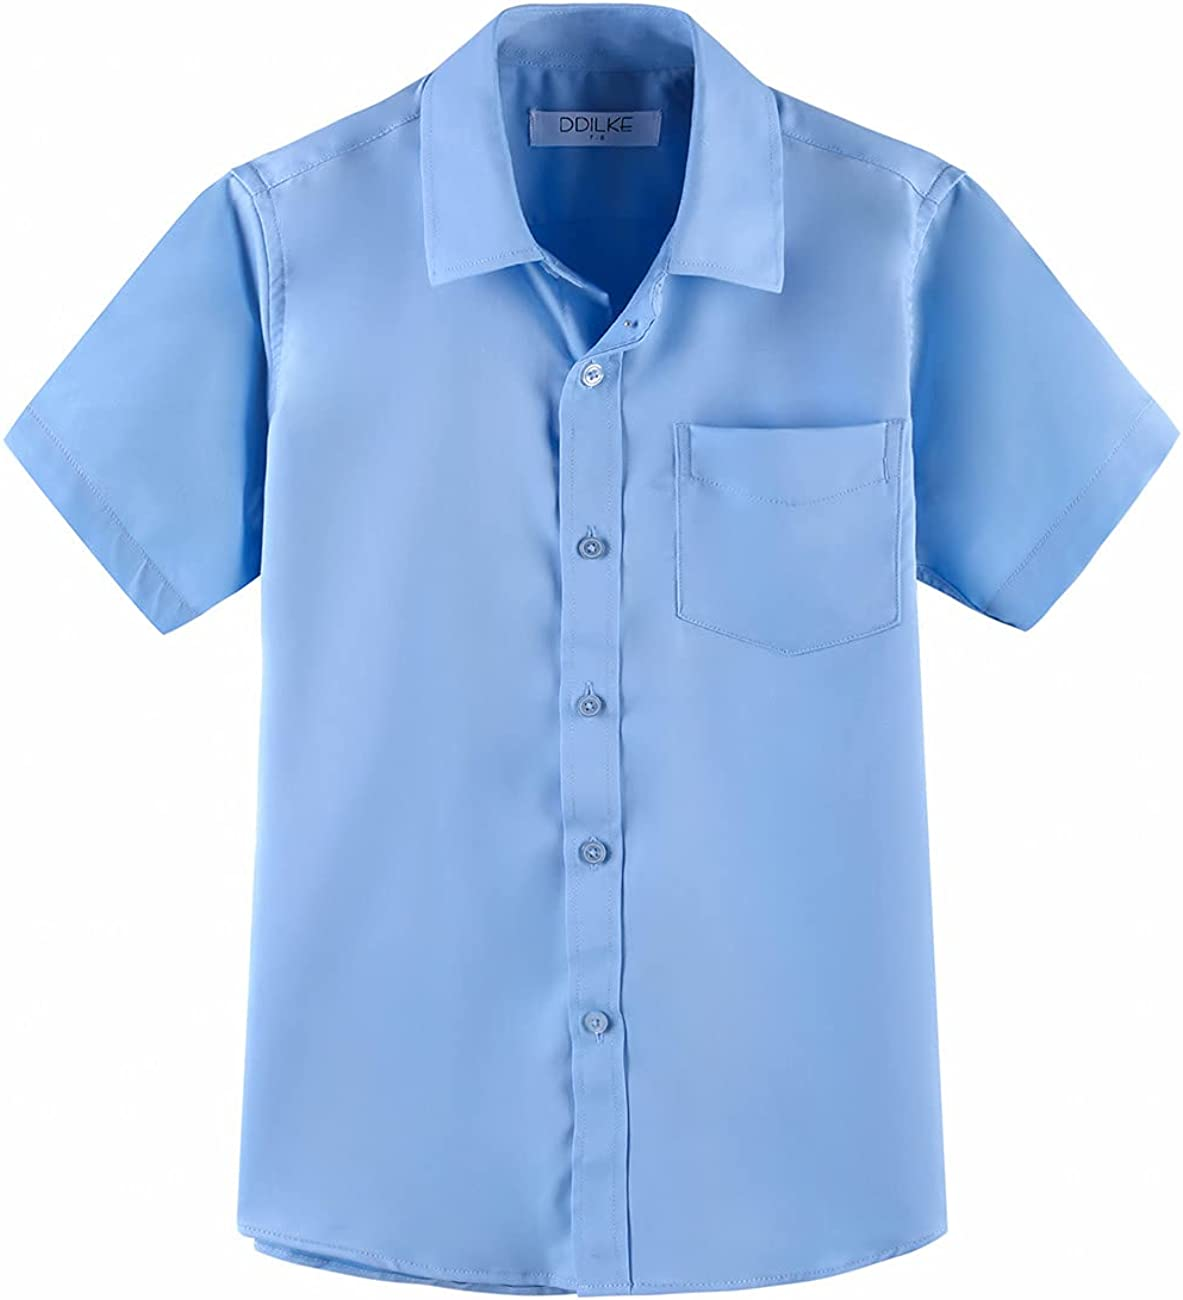 DDILKE Boys' Short Sleeve Dress Shirt Casual Button-Down Shirts, Blue, 11-12 Years